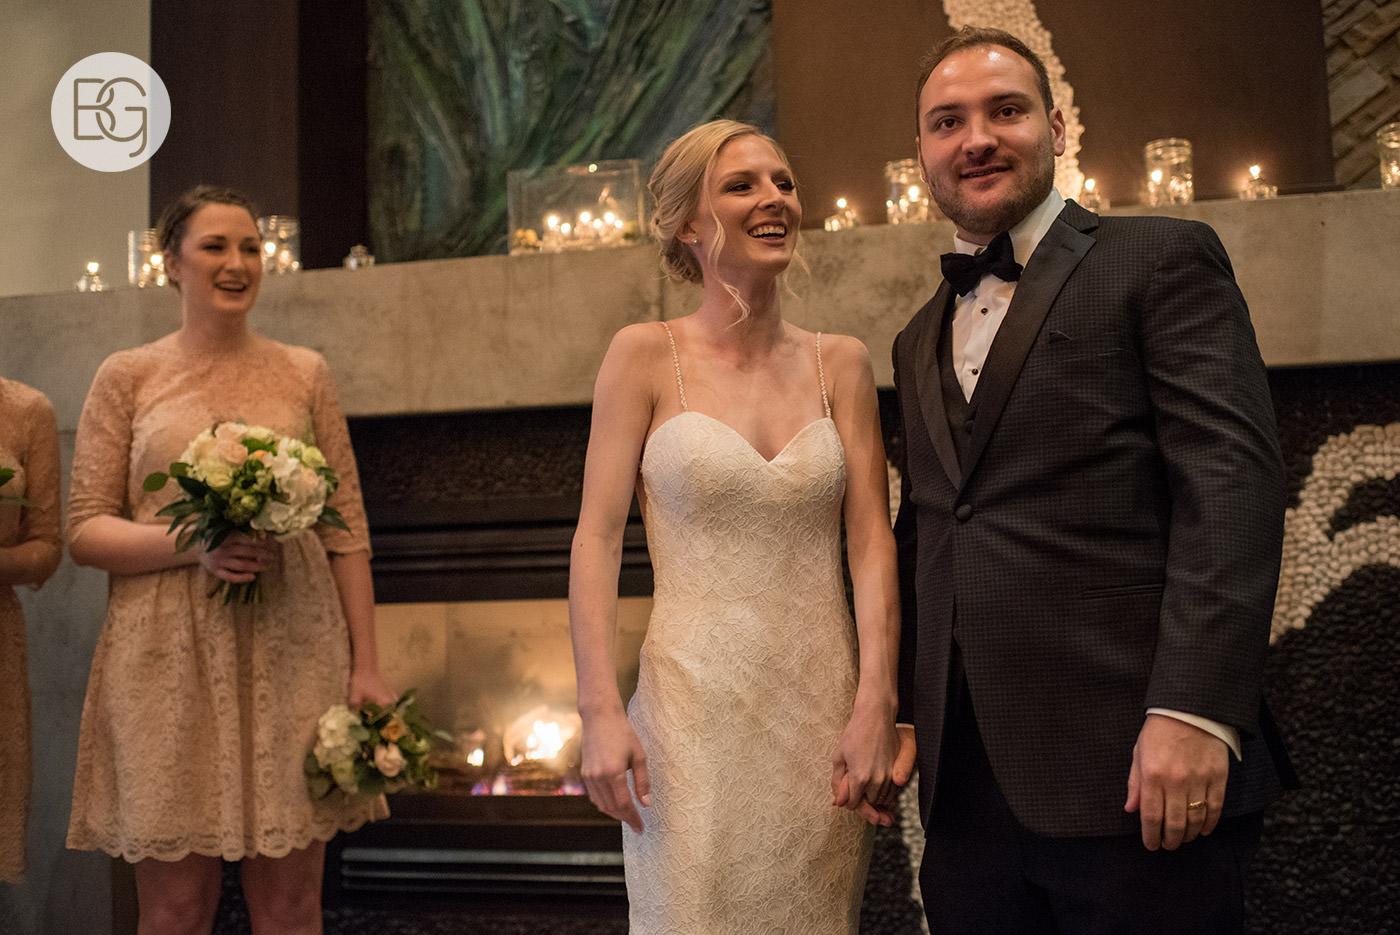 Edmonton_wedding_photographers_josh_sara_whyte_31.jpg